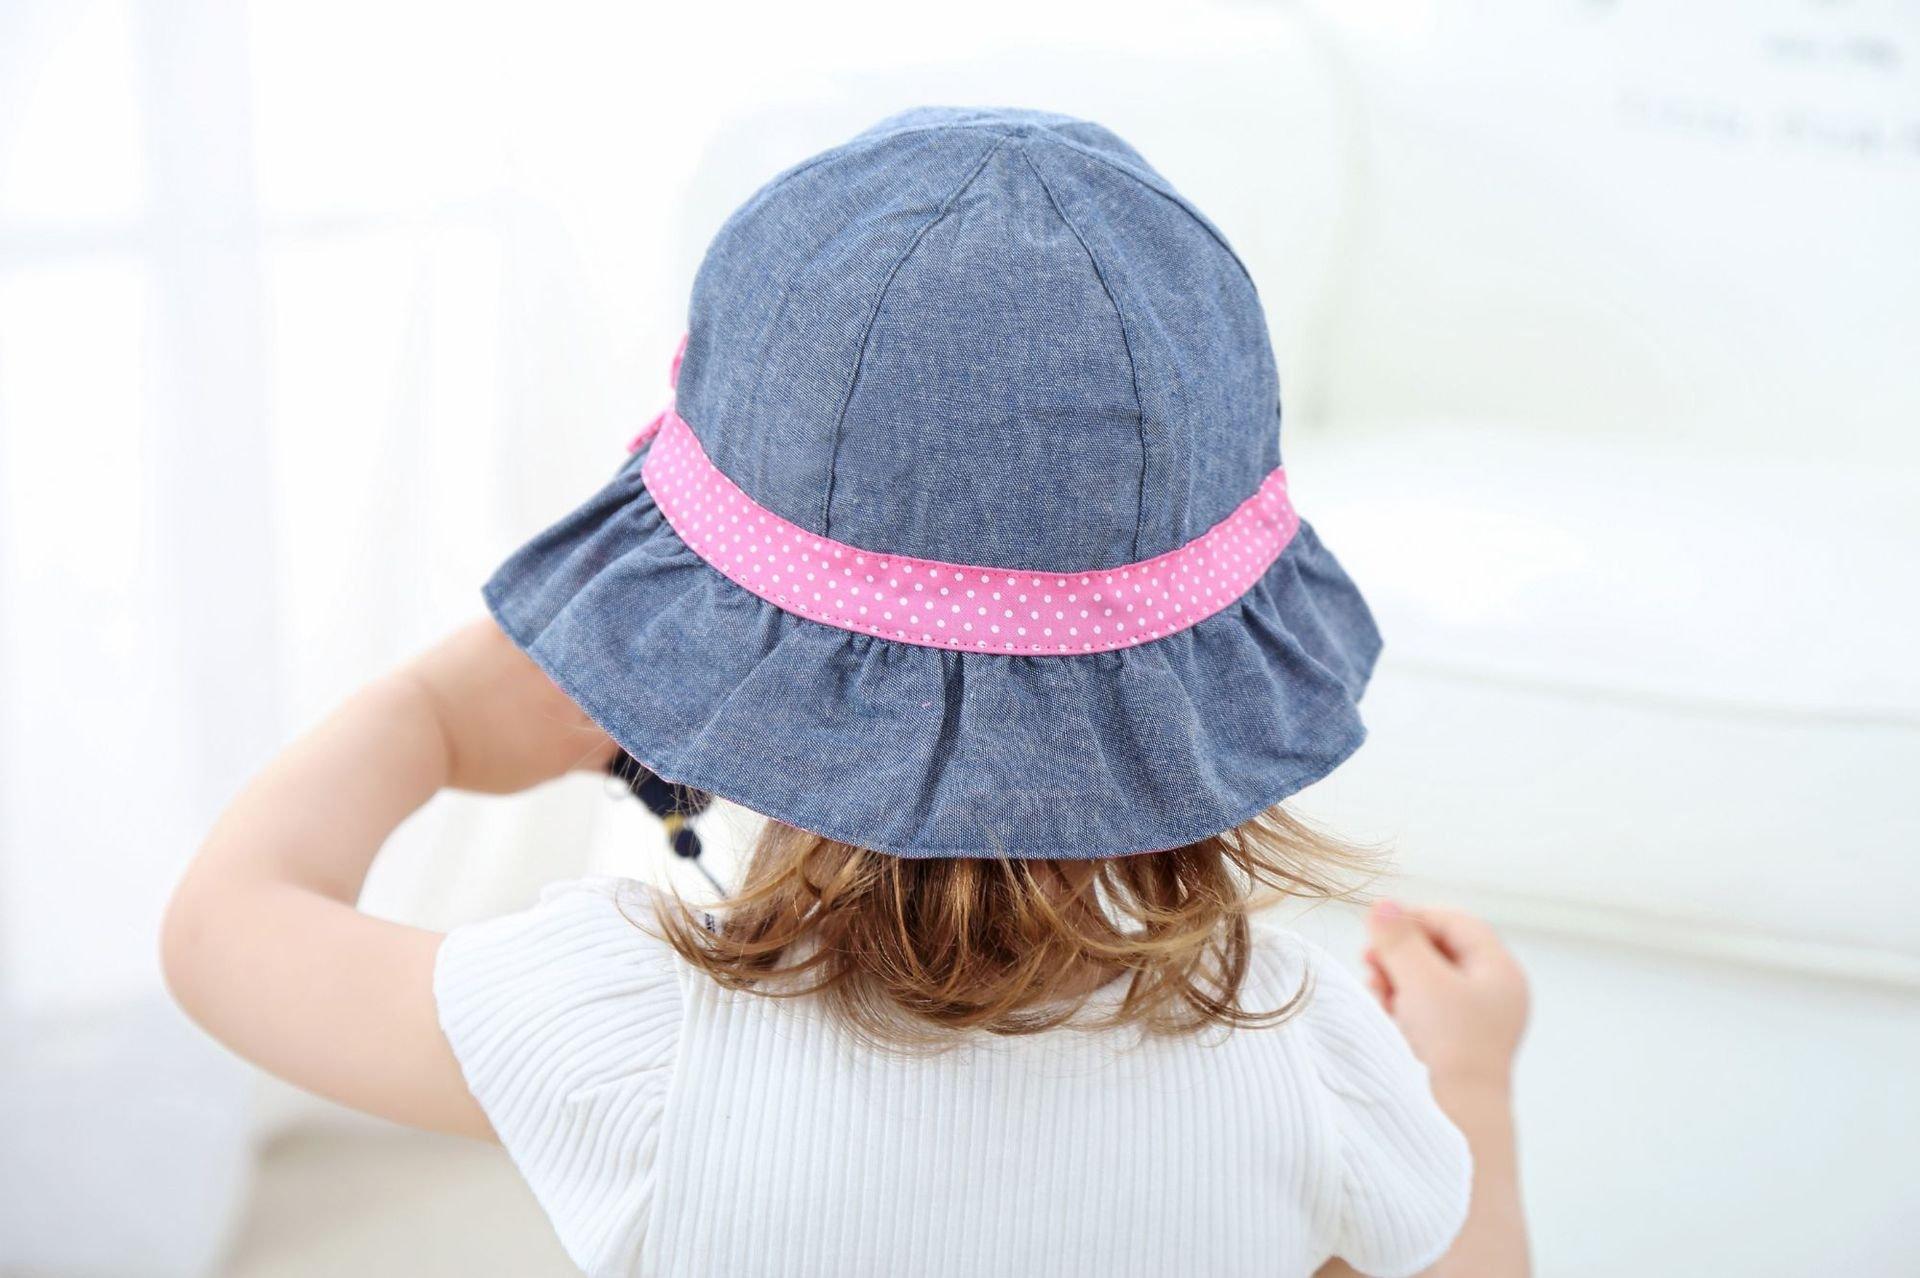 Toddler Baby Girls Denim Sun Hats with Chin Strap Kid Summer Cotton Sunhat Polka Dot Caps by HUIXIANG (Image #7)